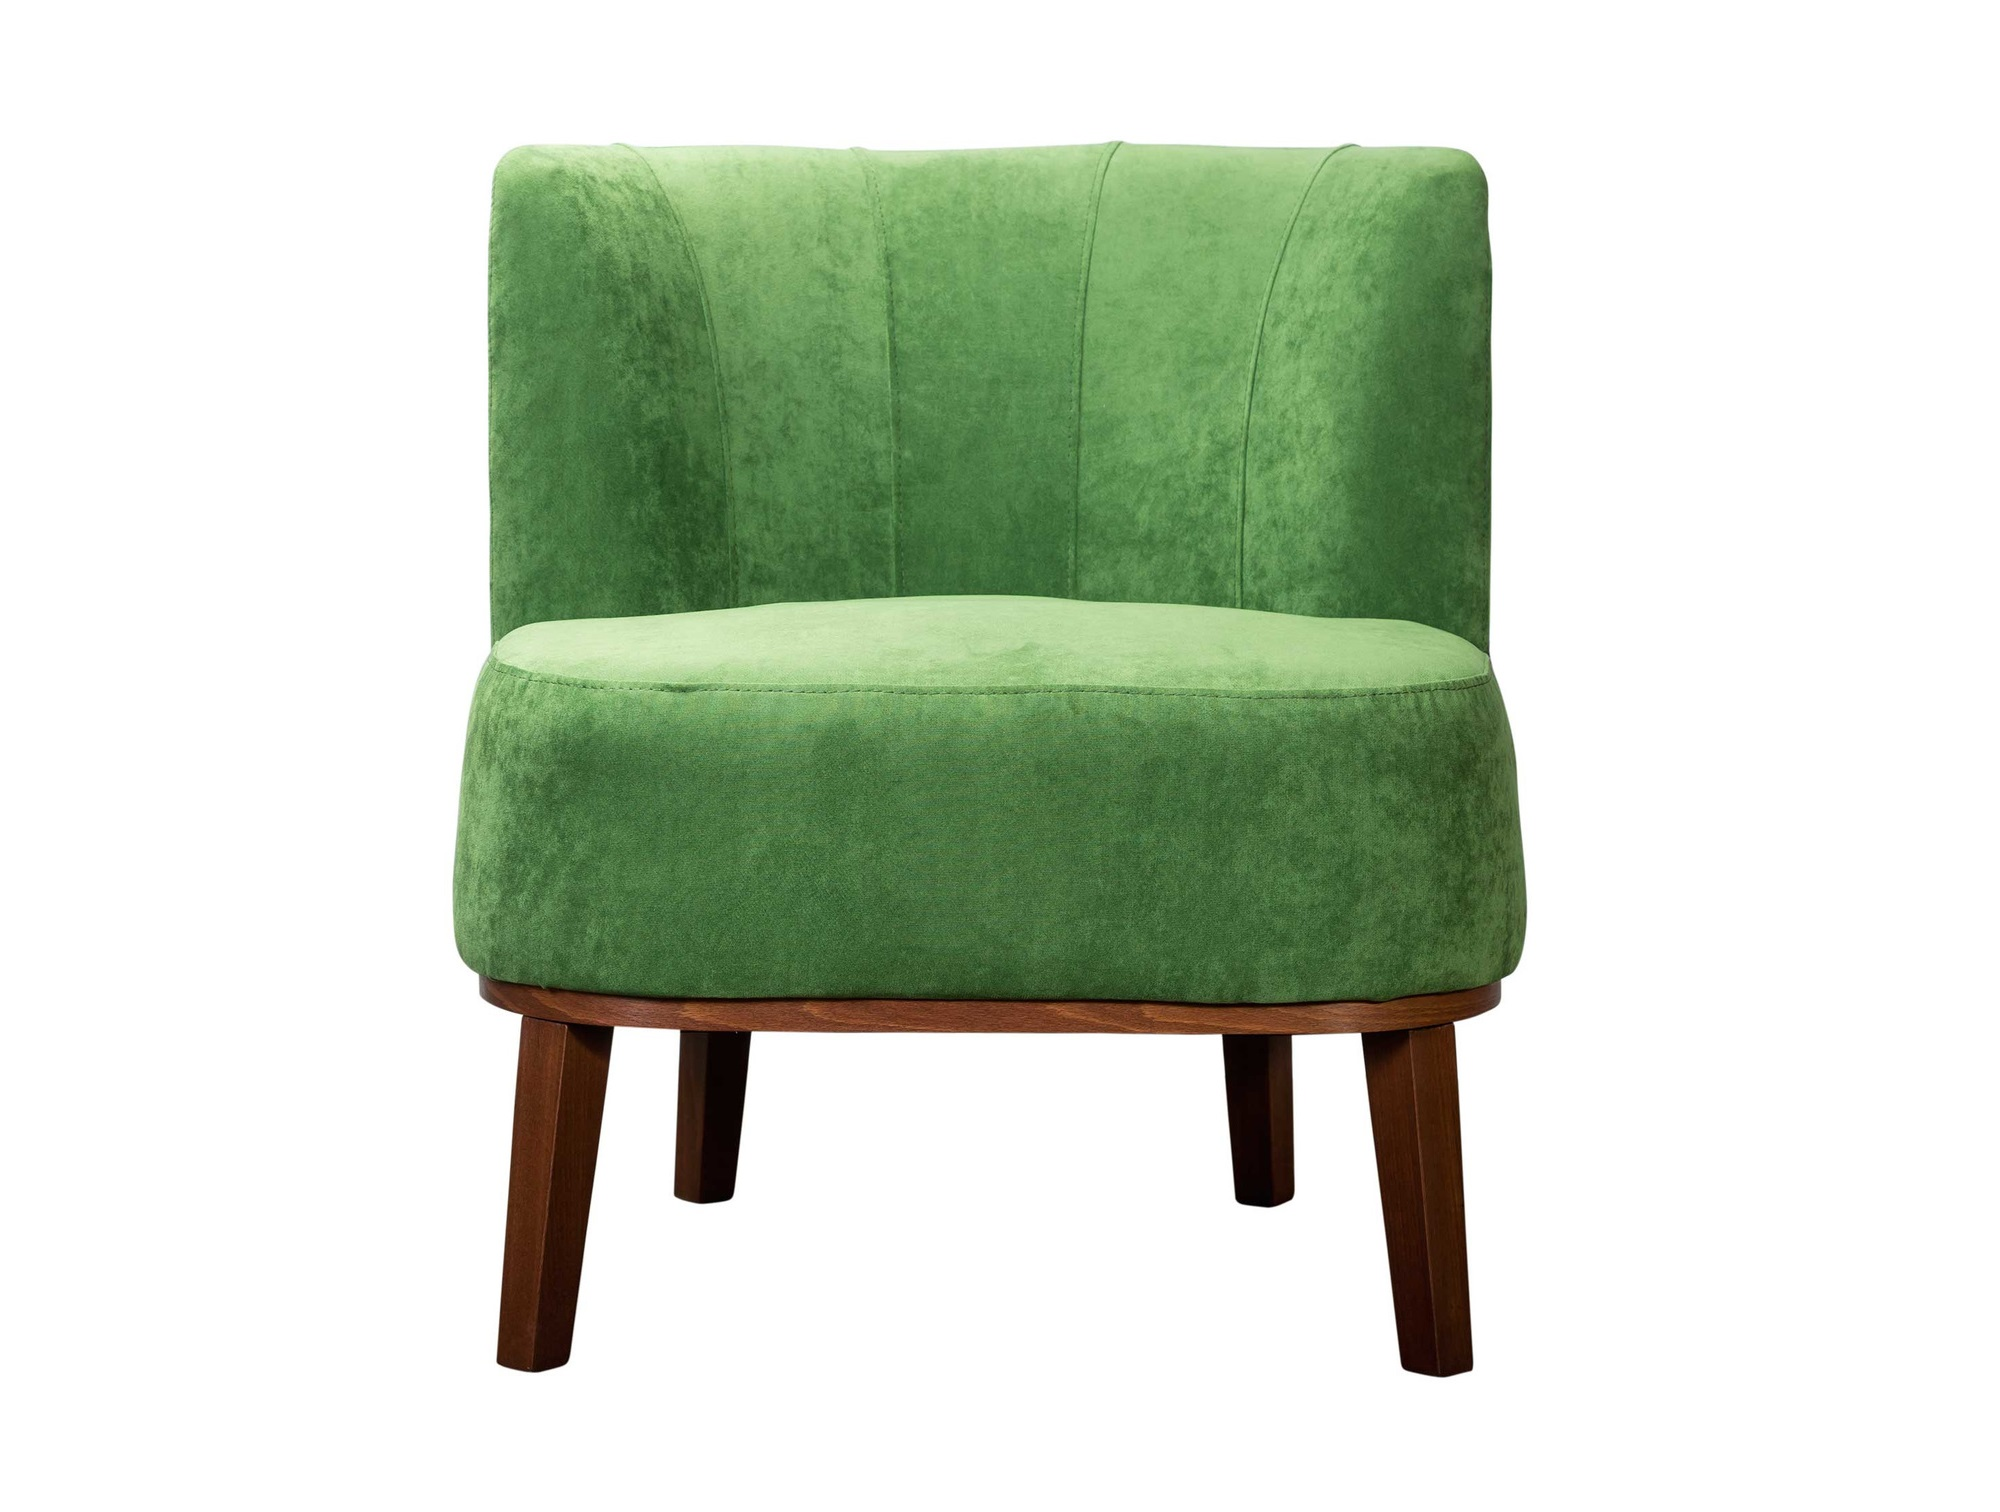 Кресло шафран эко (r-home) зеленый 66.0x75.0x62.0 см. фото